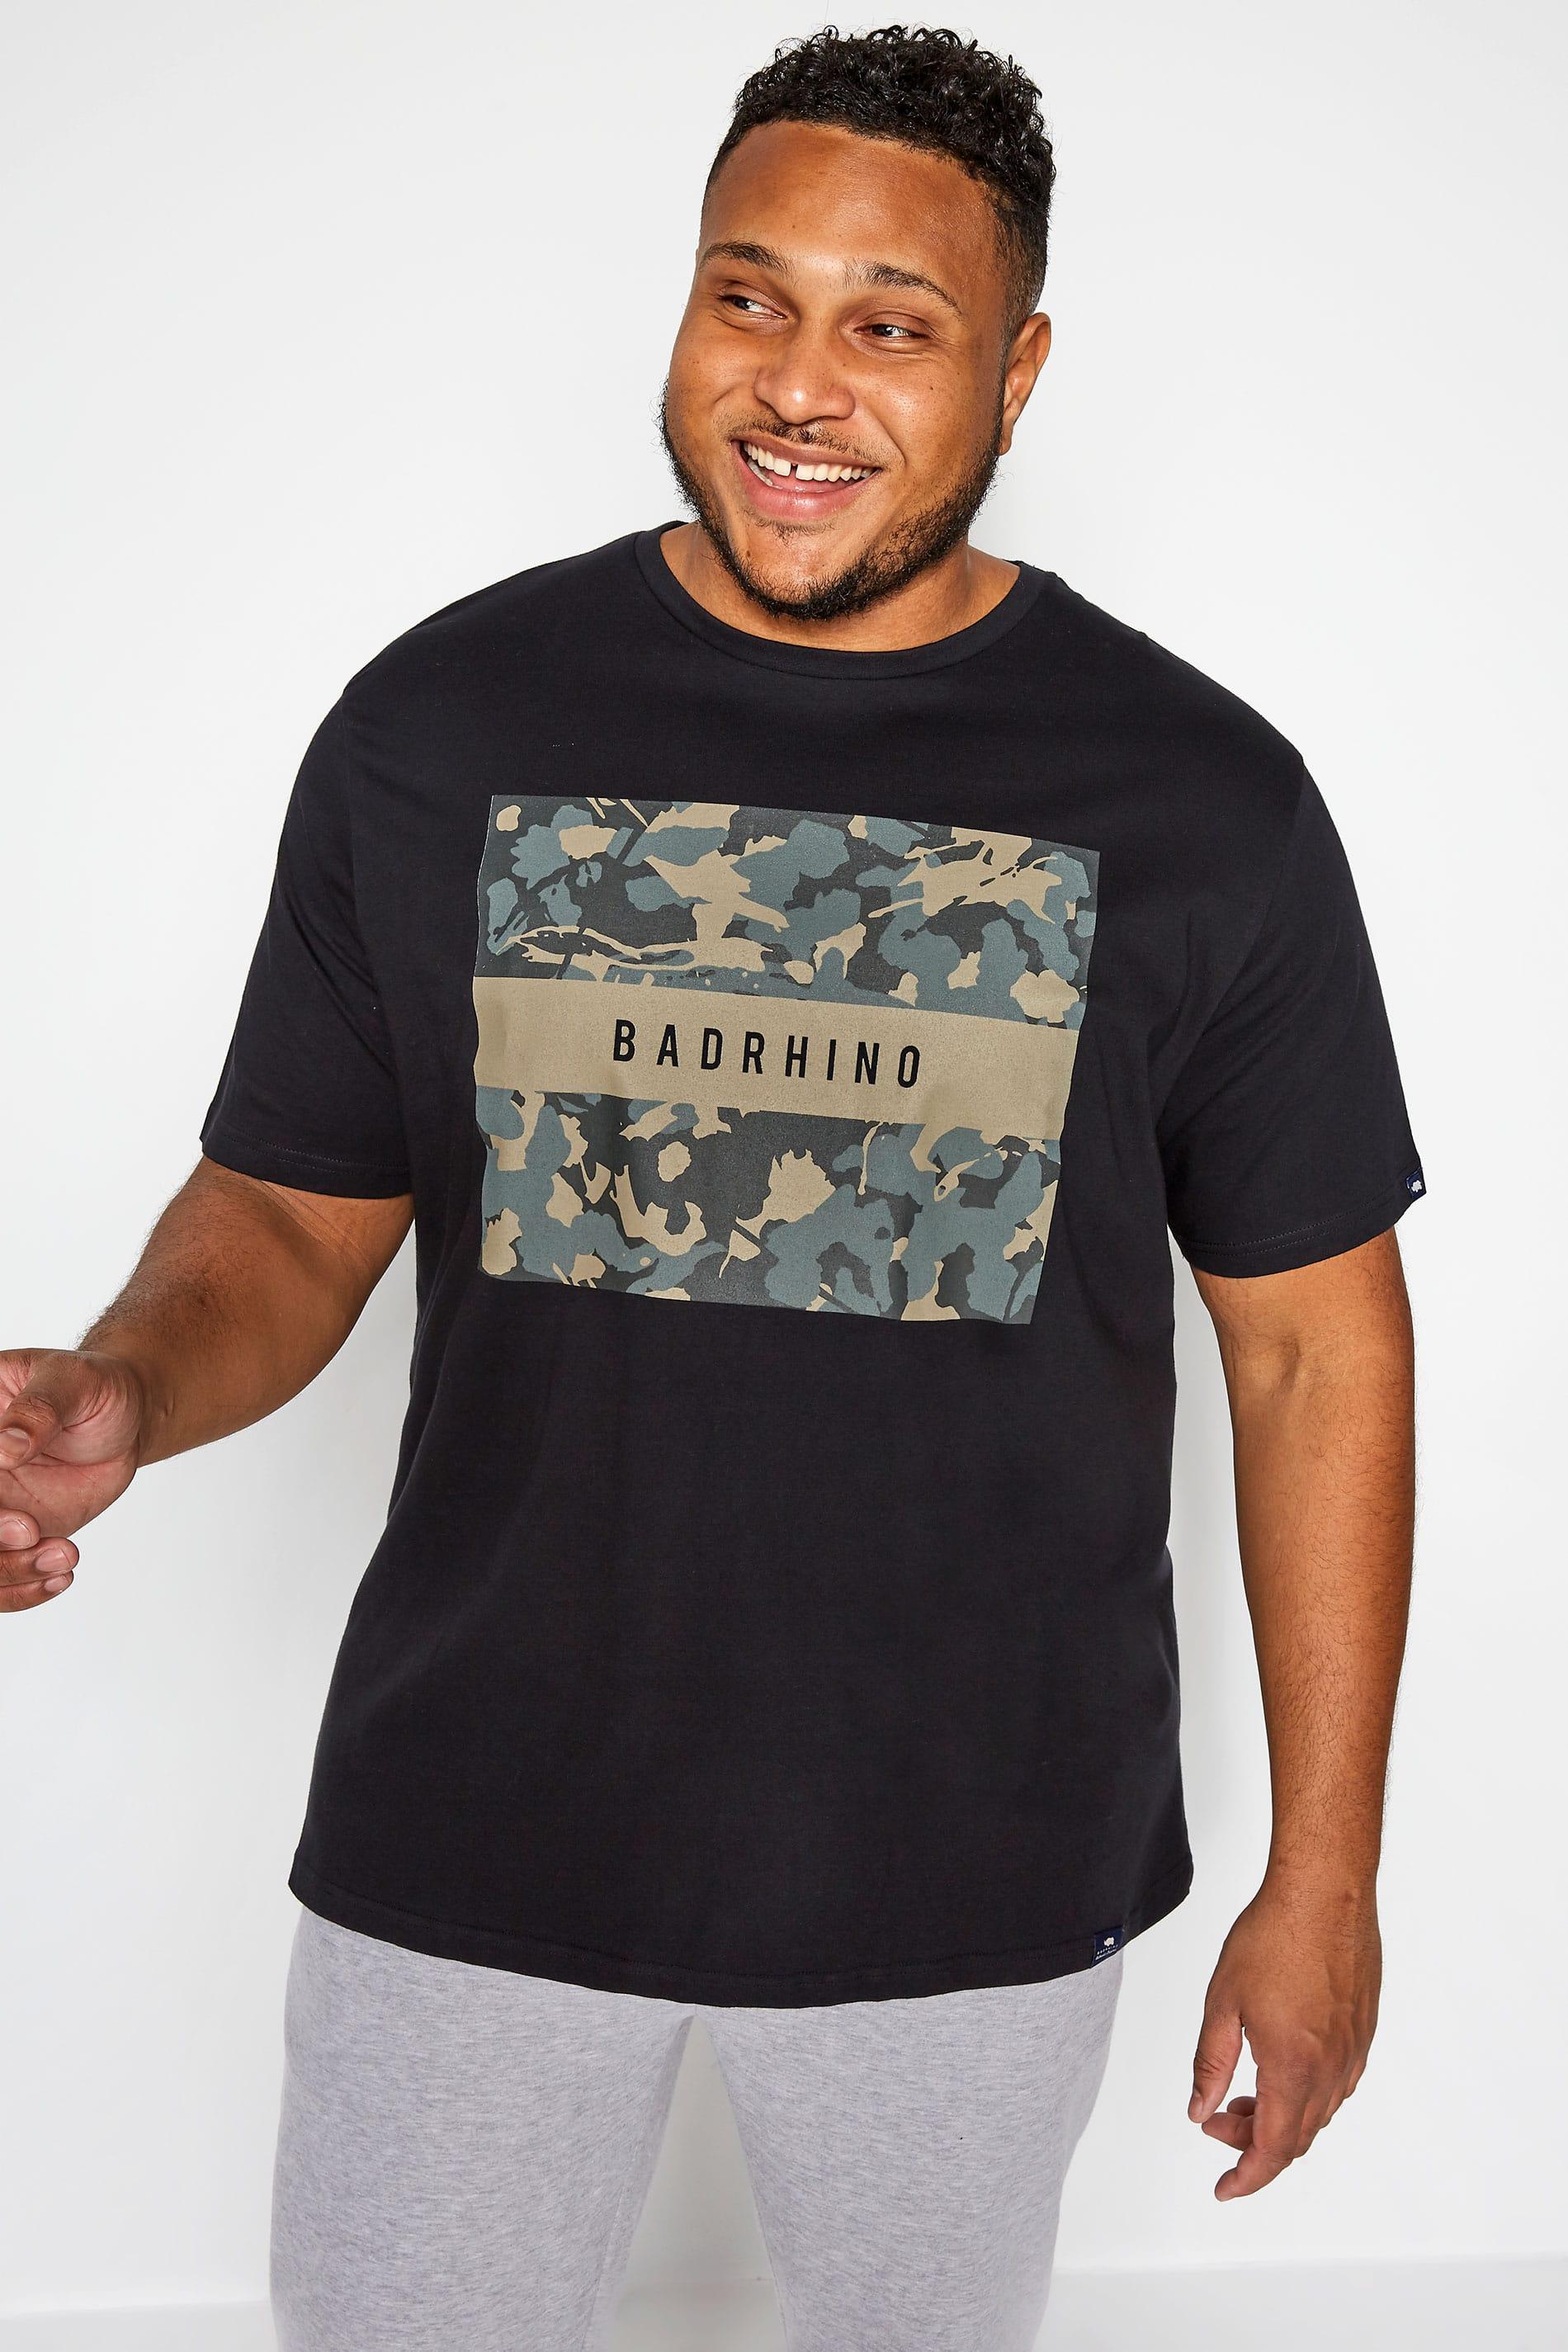 BadRhino Black Camo Graphic Print T-Shirt